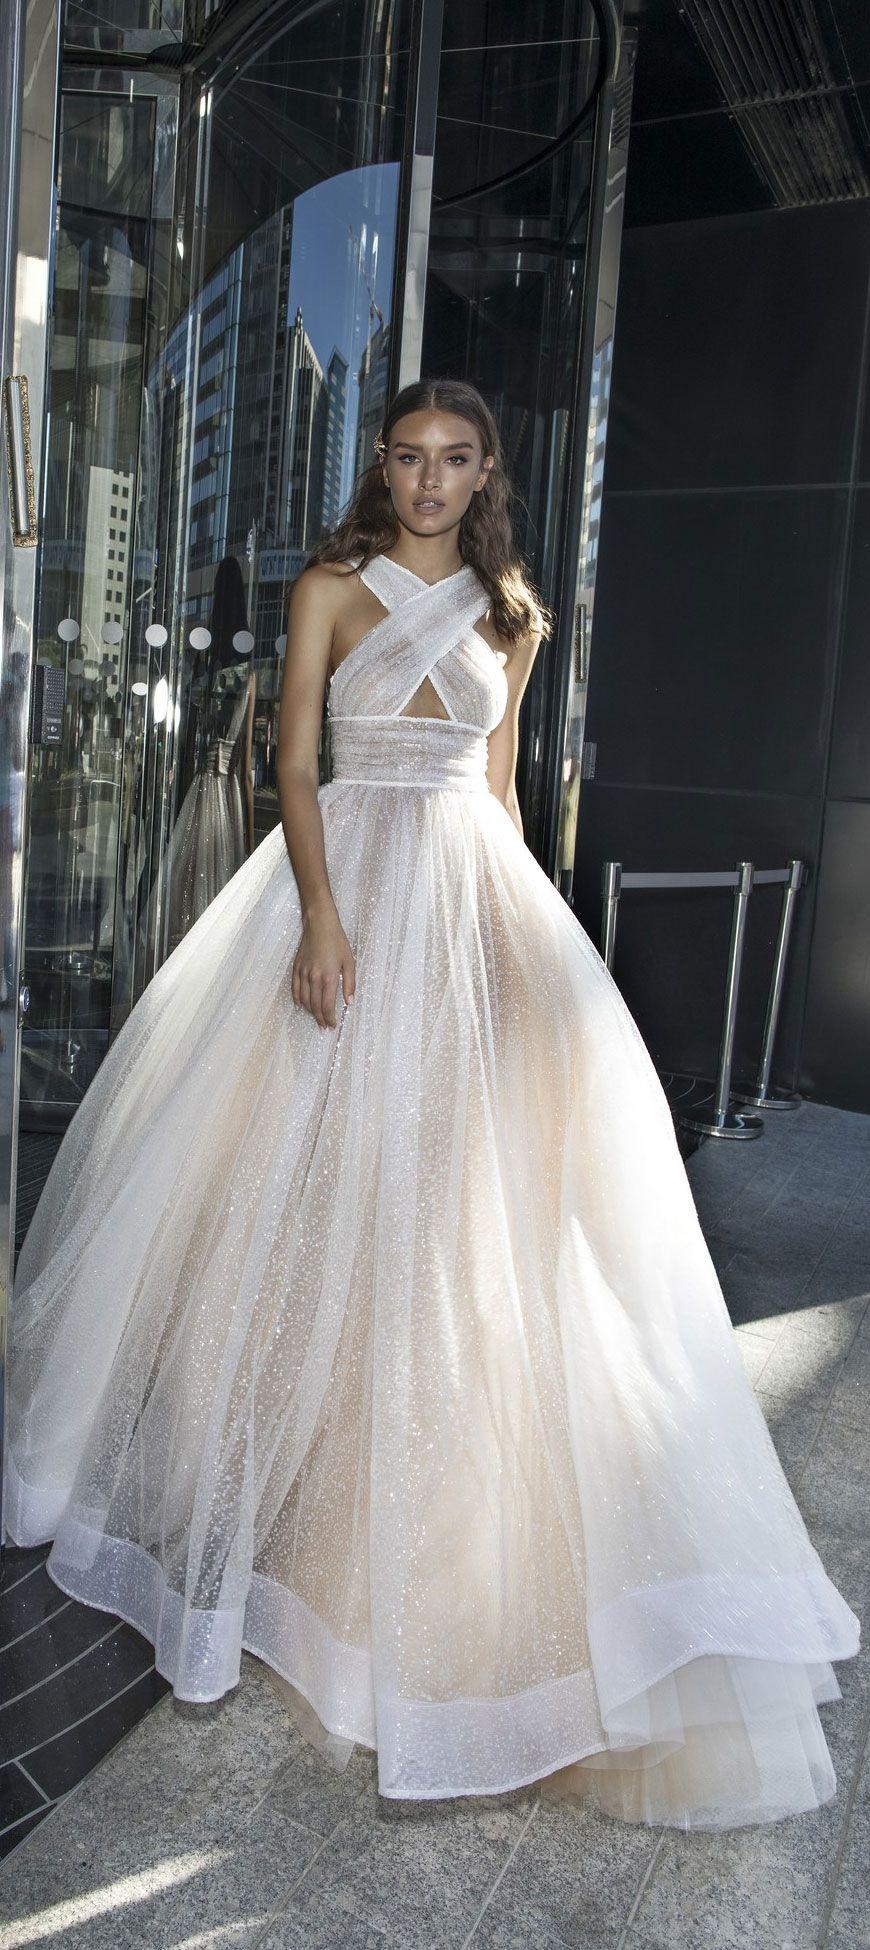 Seductive wedding dress inspiration